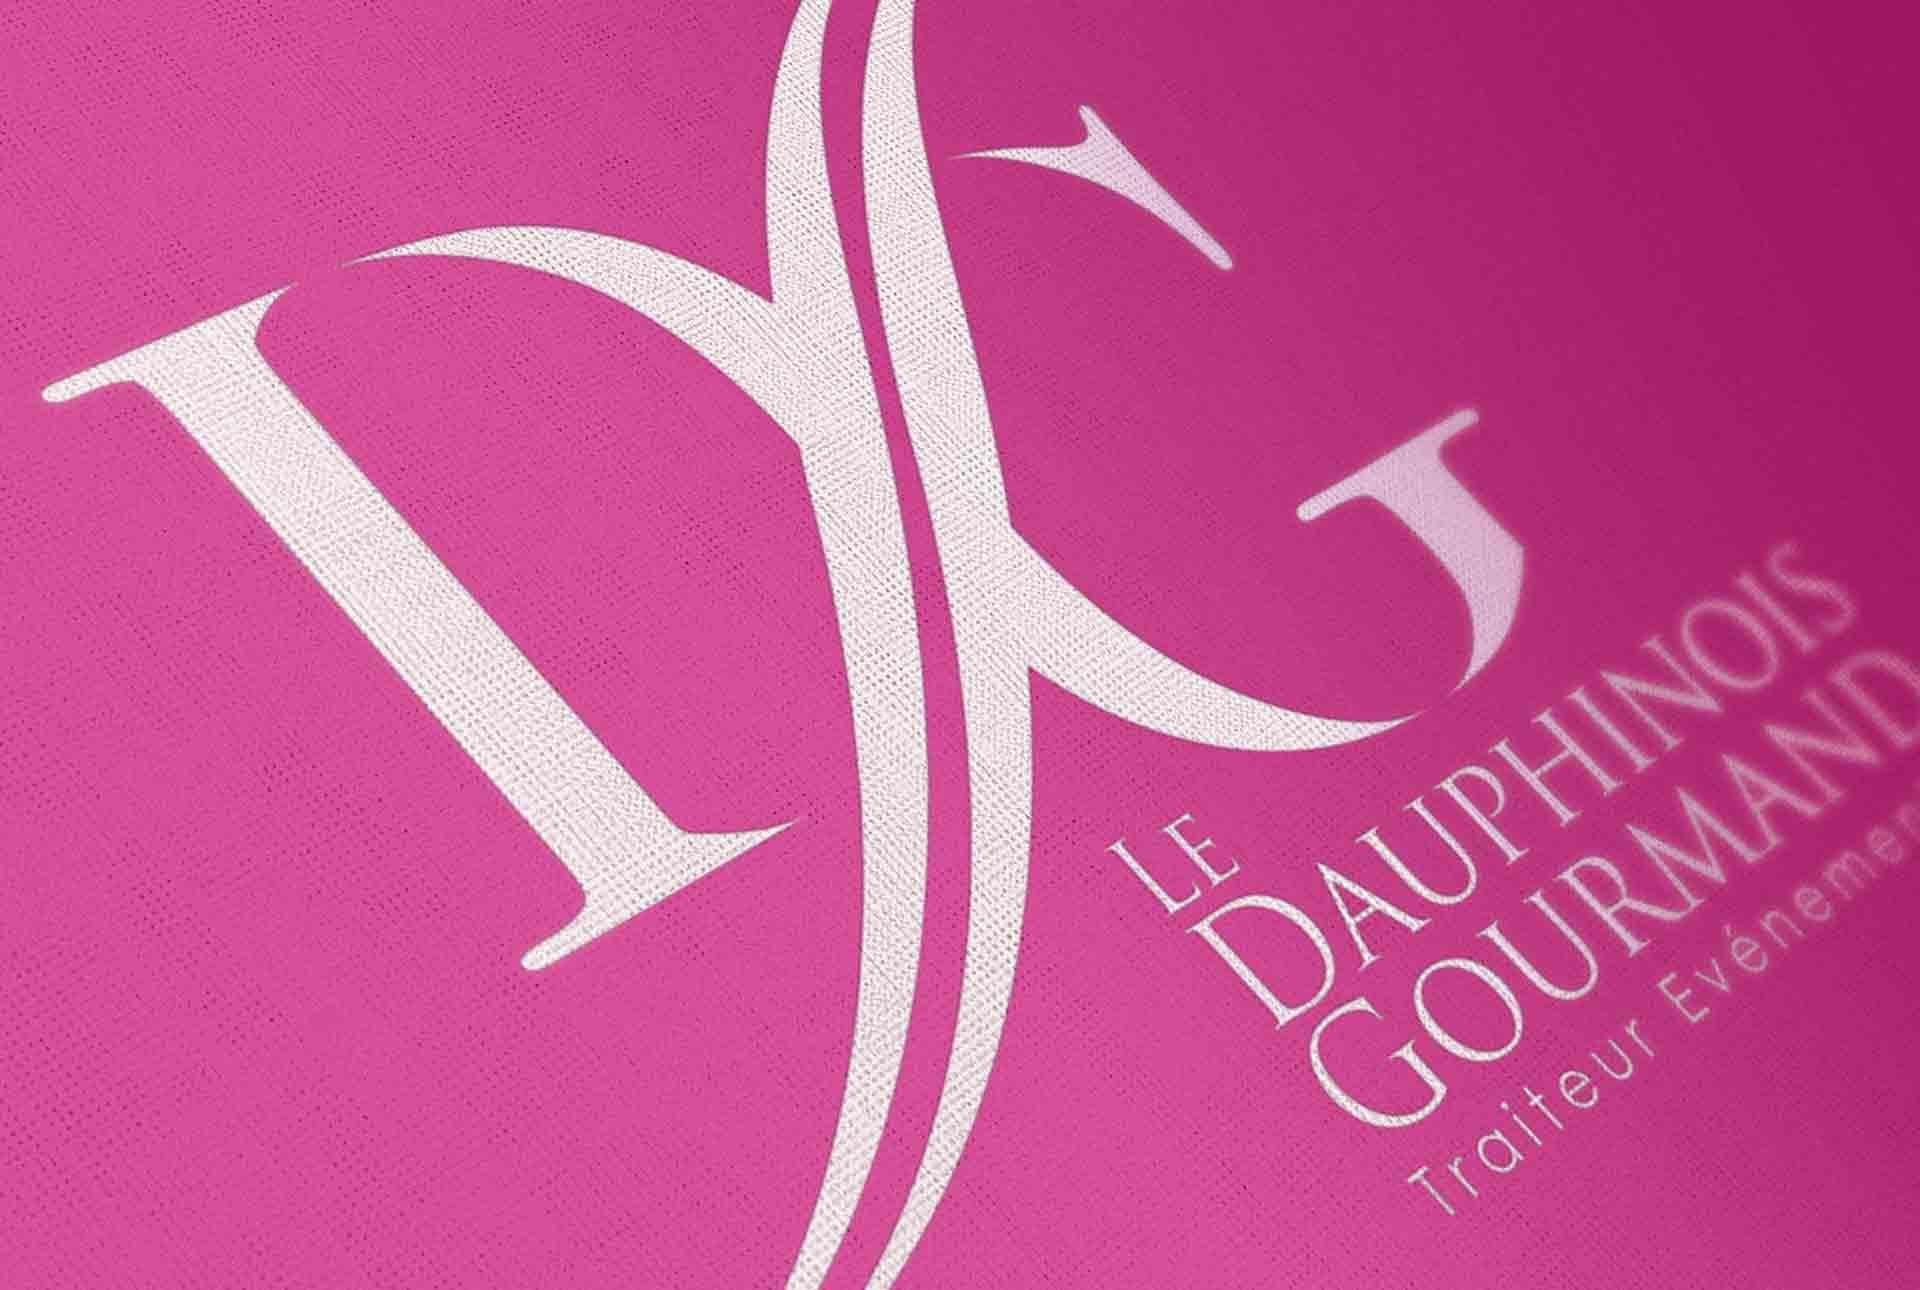 Dauphinois creation logo traiteur graphiste grenoble